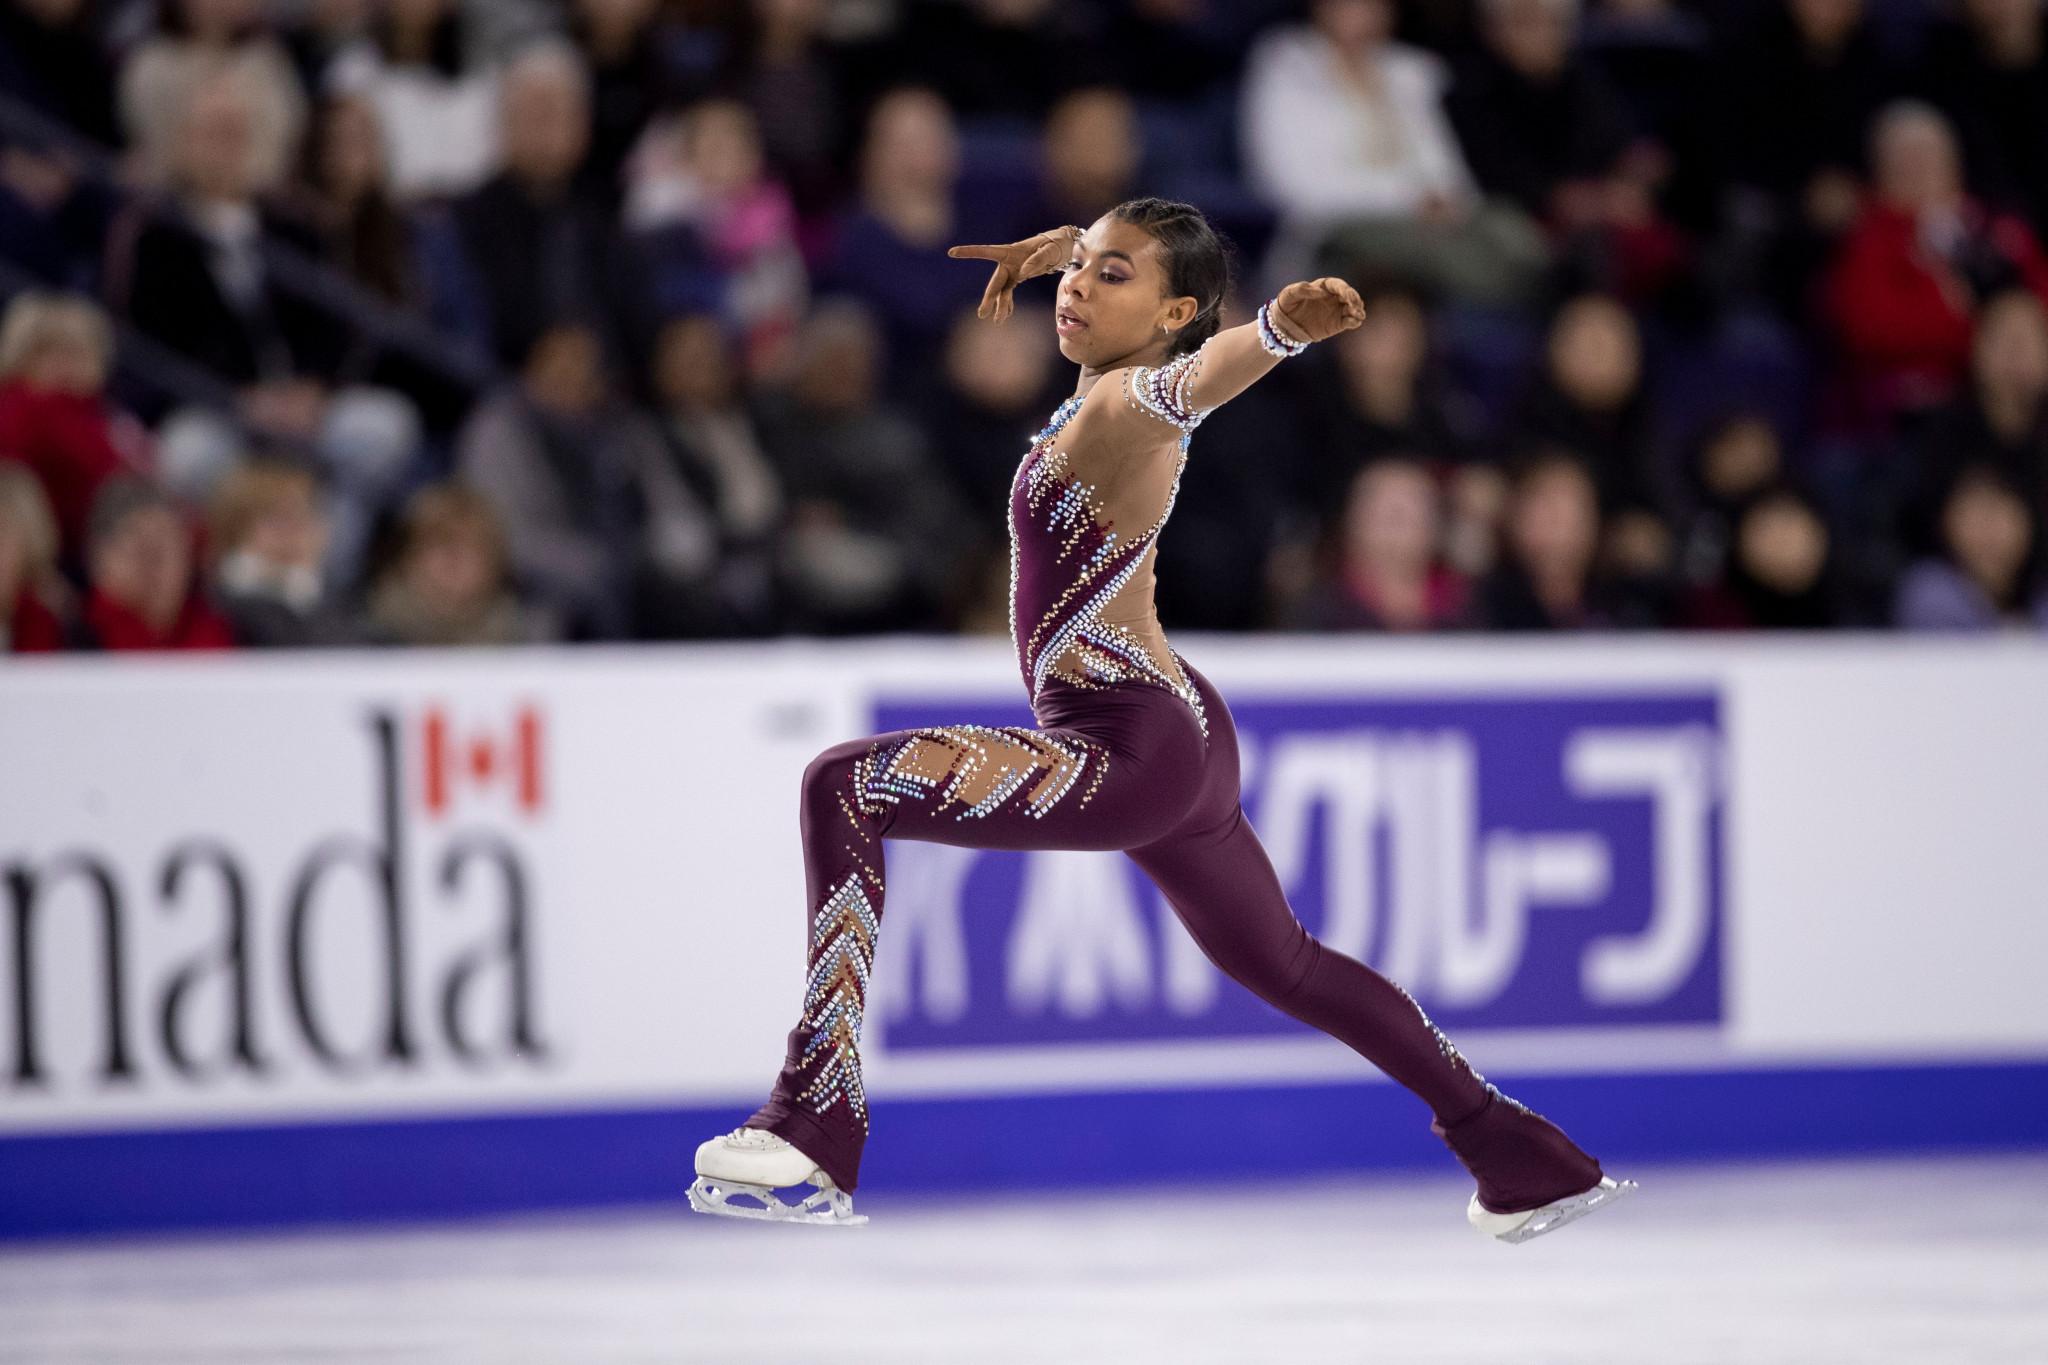 Russia and US aim to dominate ISU World Junior Figure Skating Championships